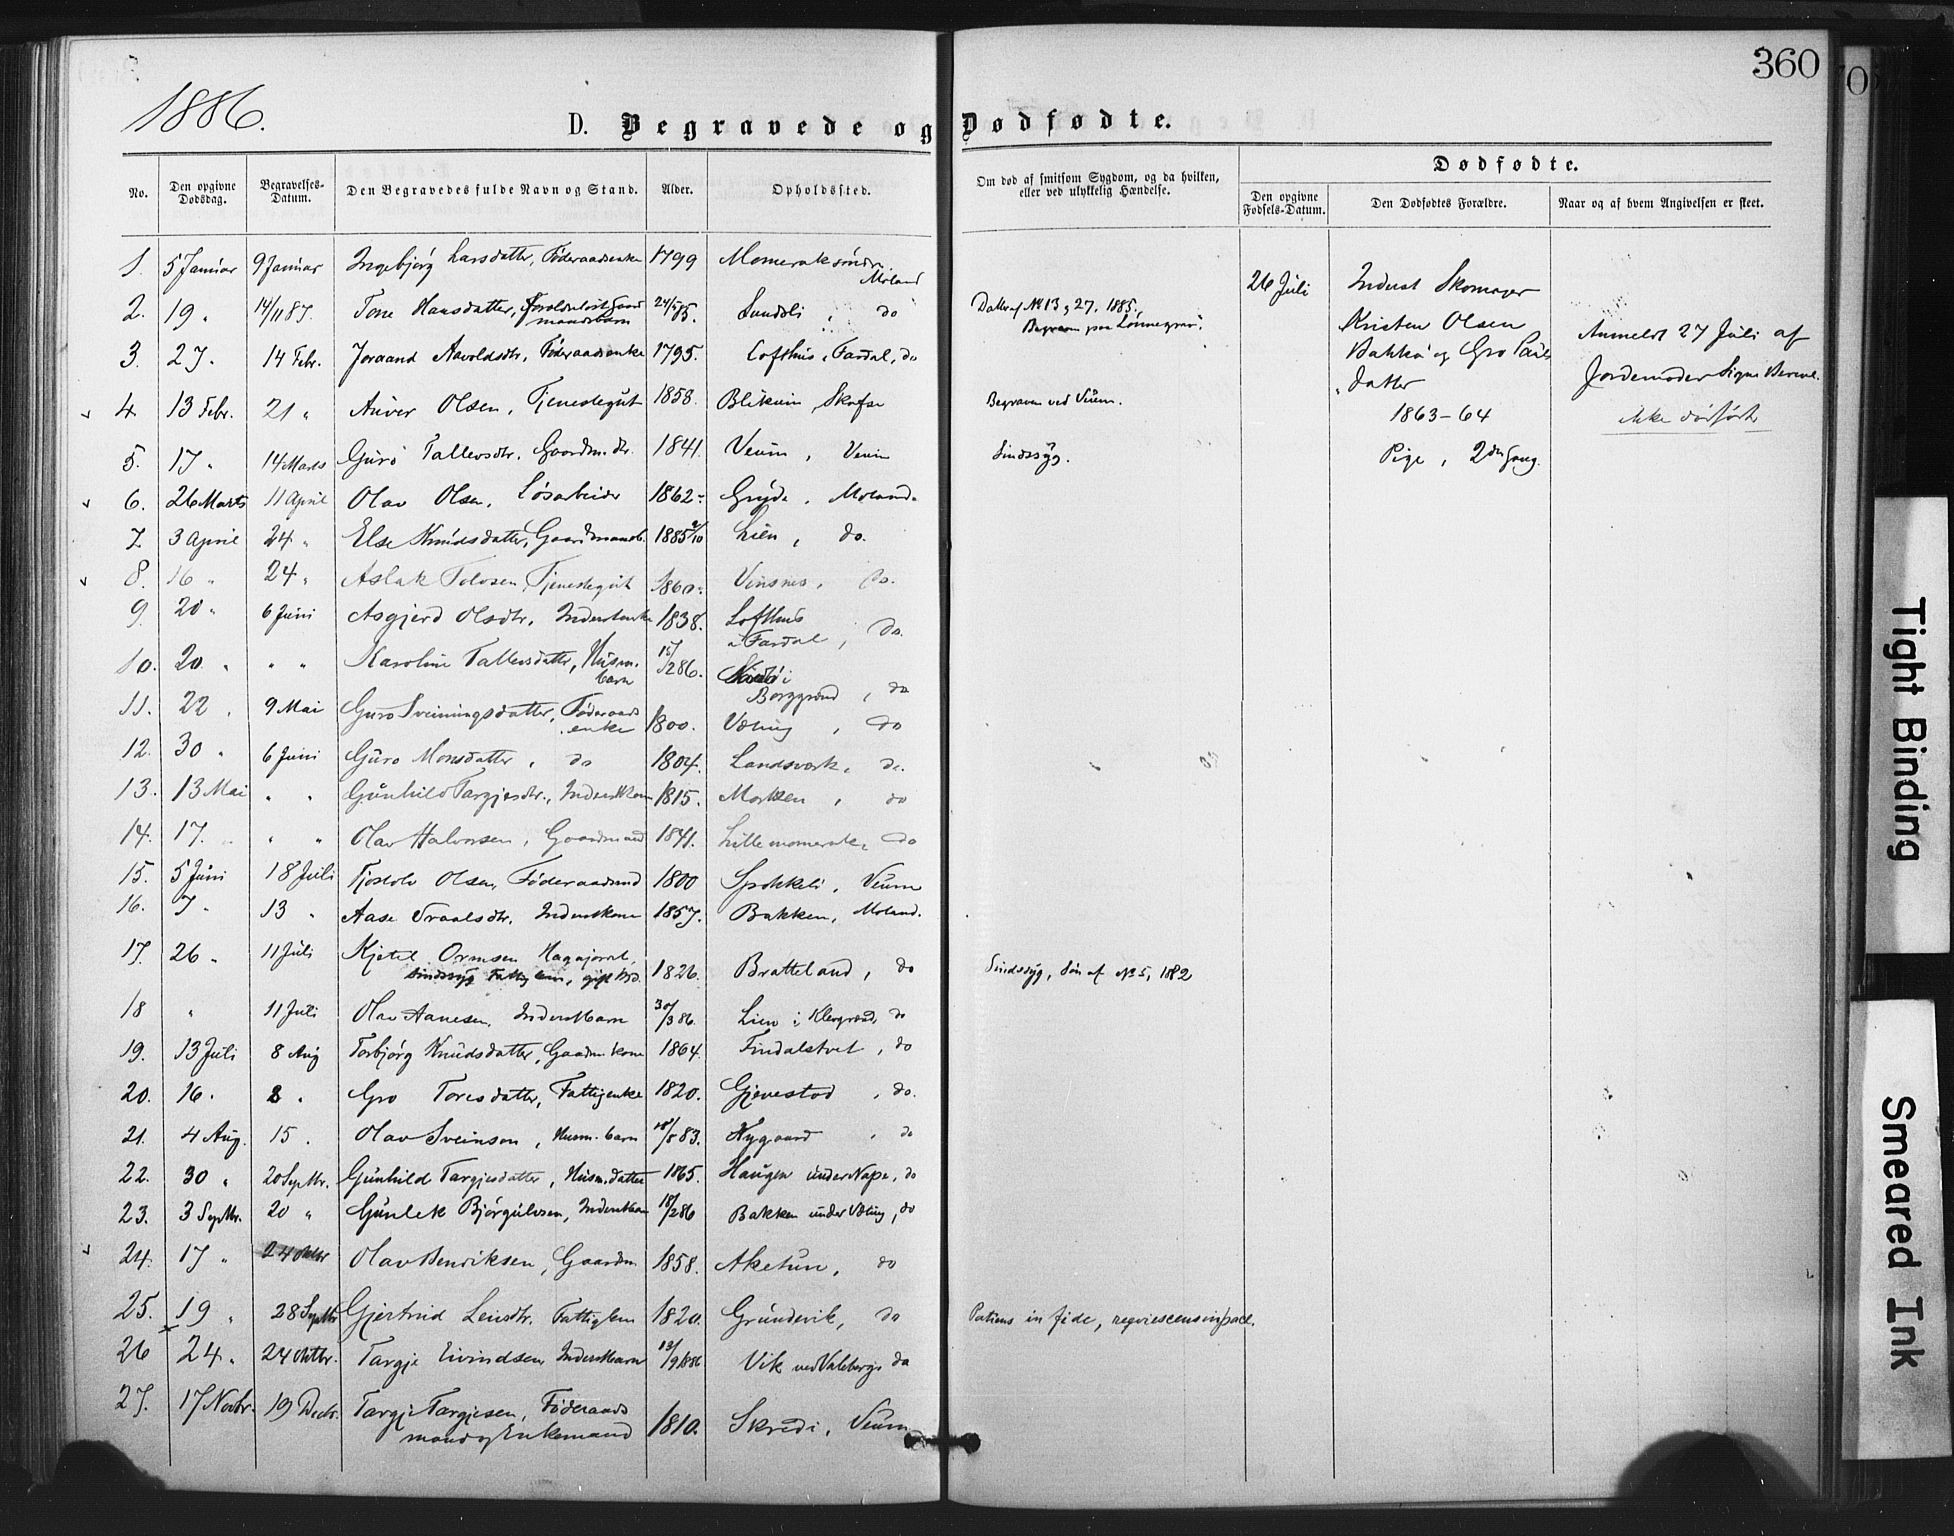 SAKO, Fyresdal kirkebøker, F/Fa/L0006: Parish register (official) no. I 6, 1872-1886, p. 360